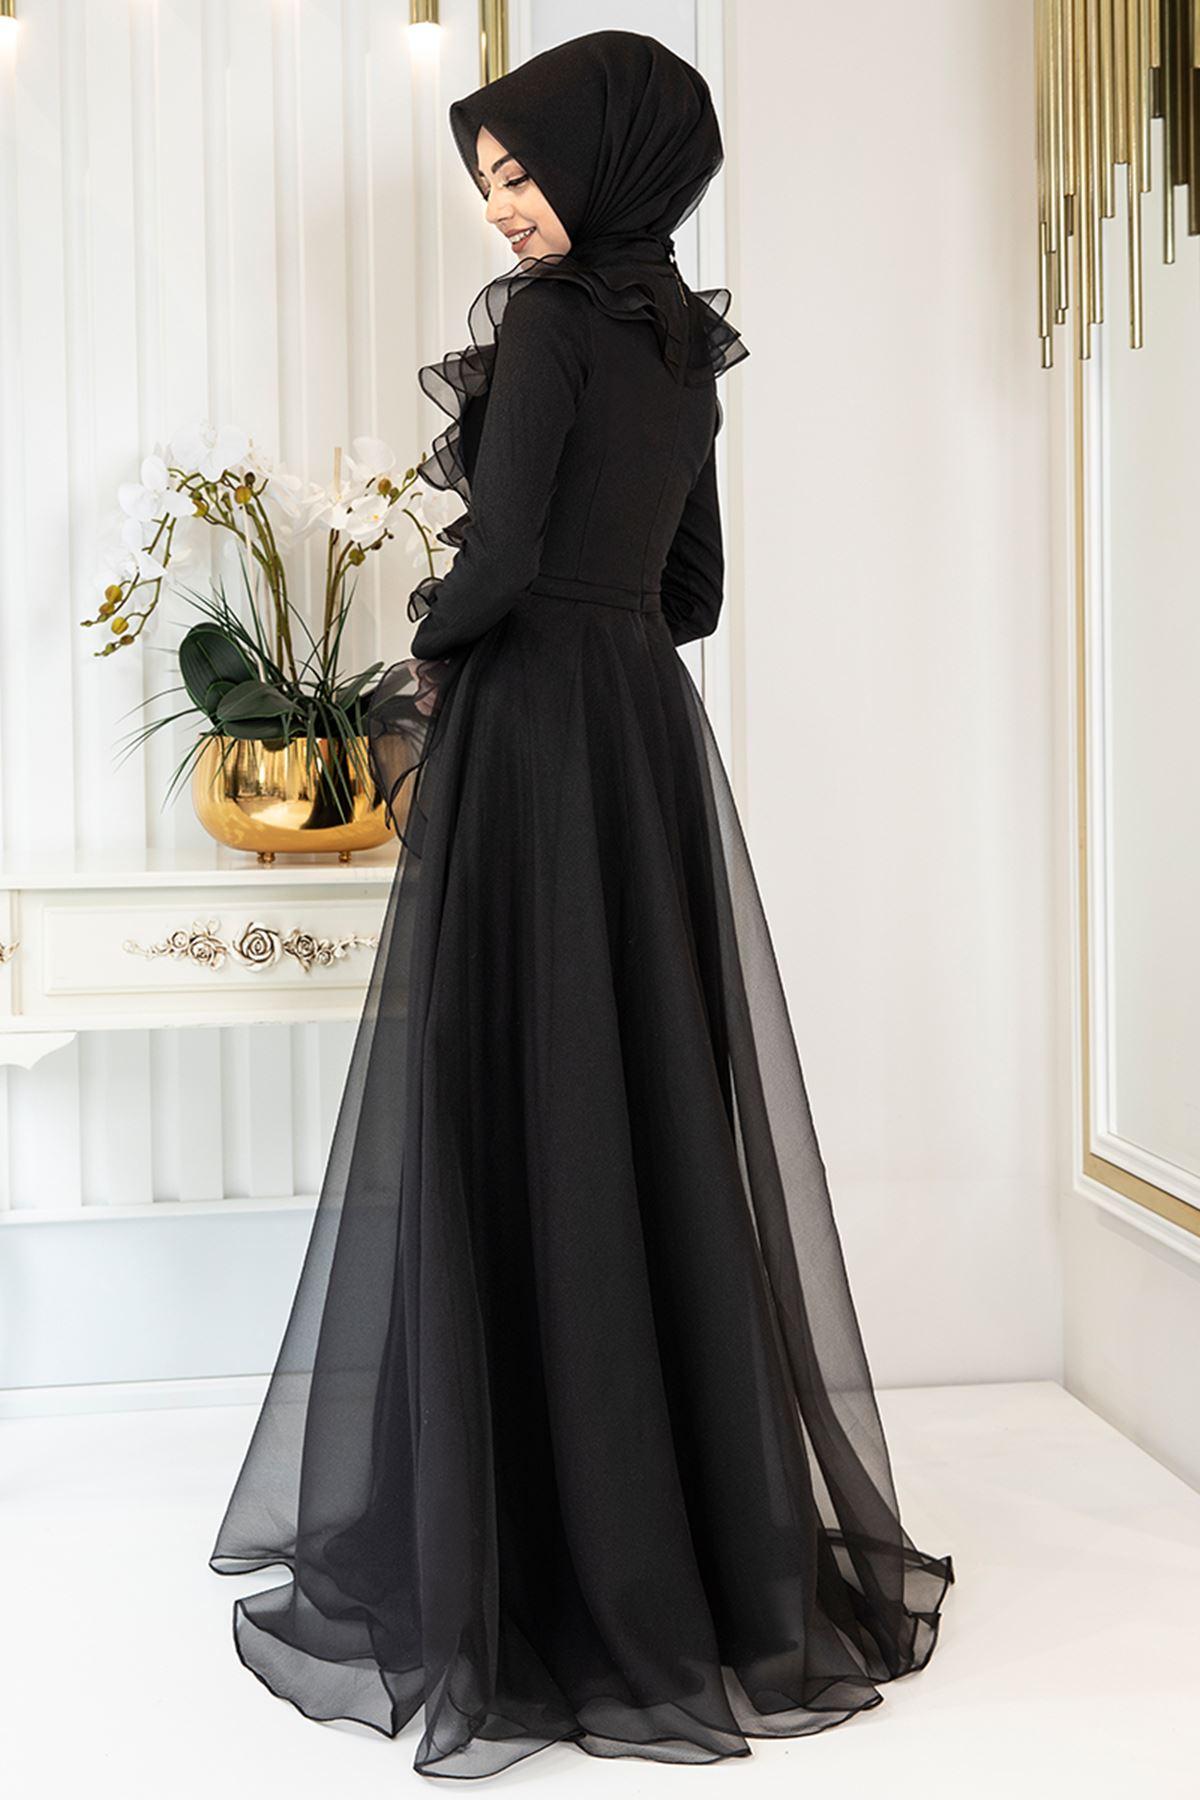 Pınar Şems Zara Abiye Siyah PNR6139